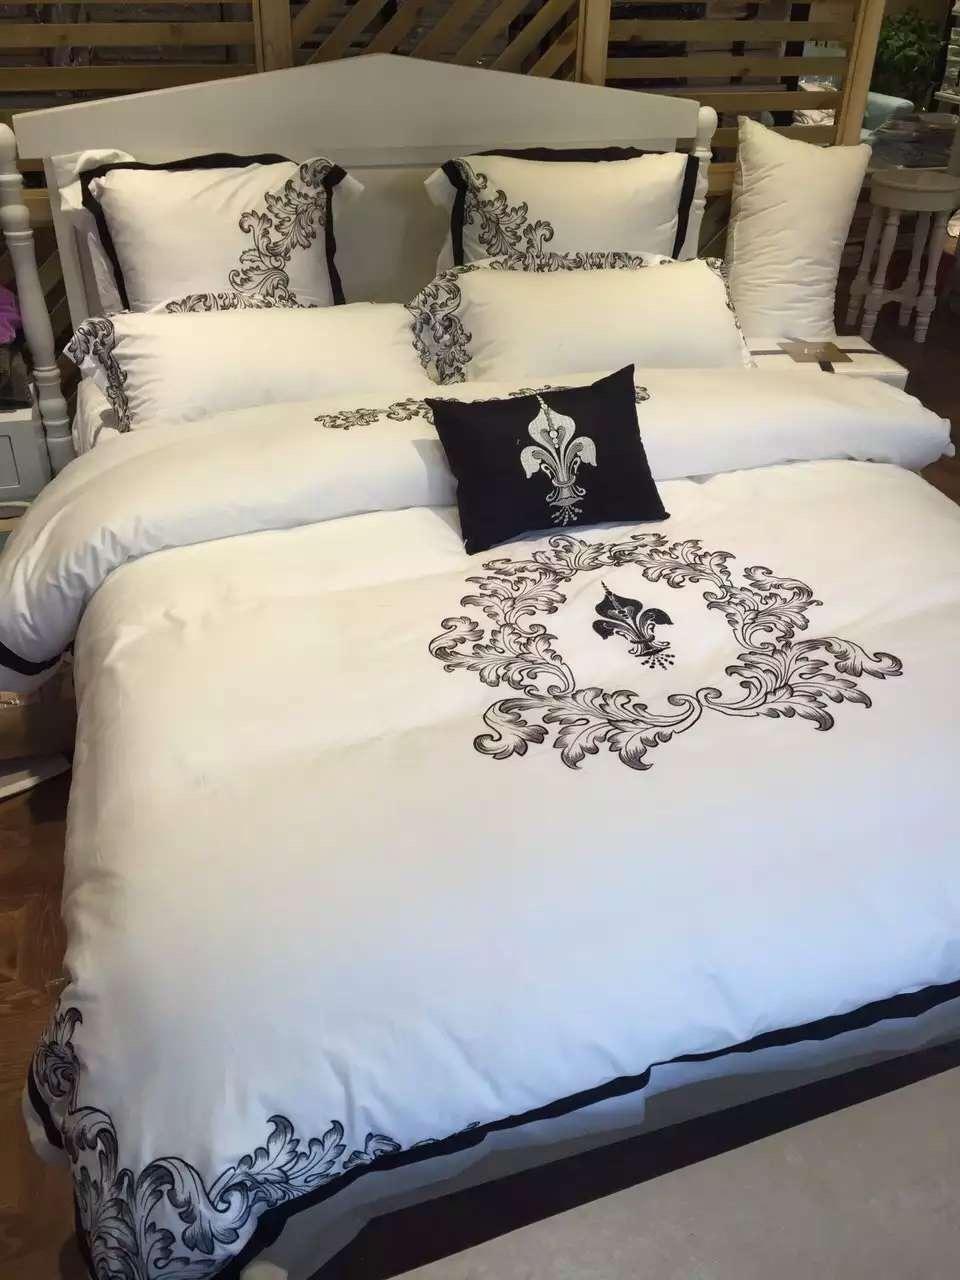 buy 4pcs 100 cotton bedsheets 5 star luxury hotel bedding set full size bed. Black Bedroom Furniture Sets. Home Design Ideas